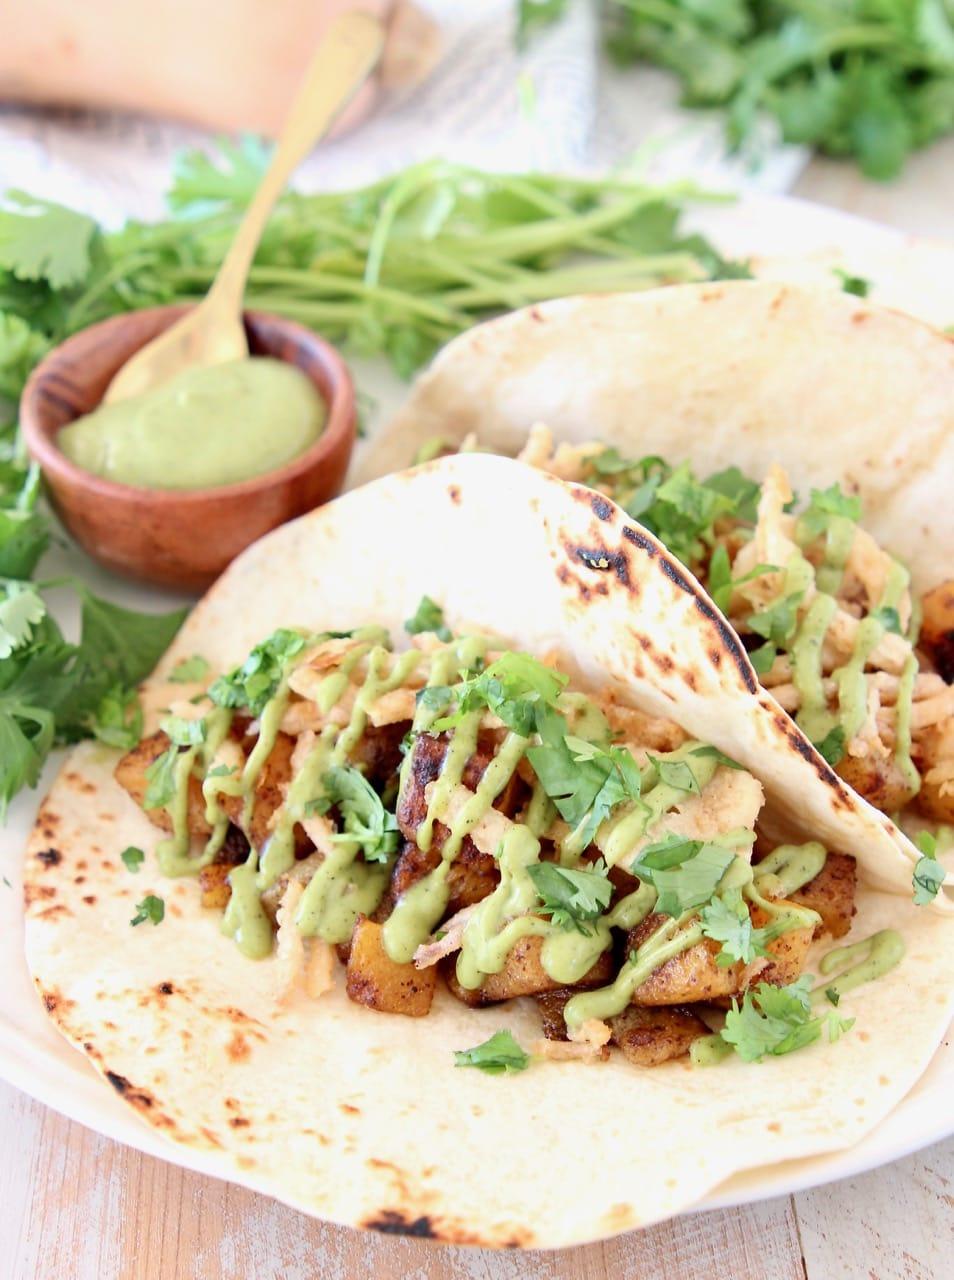 Butternut squash tacos on flour tortillas with creamy avocado sauce and fresh cilantro